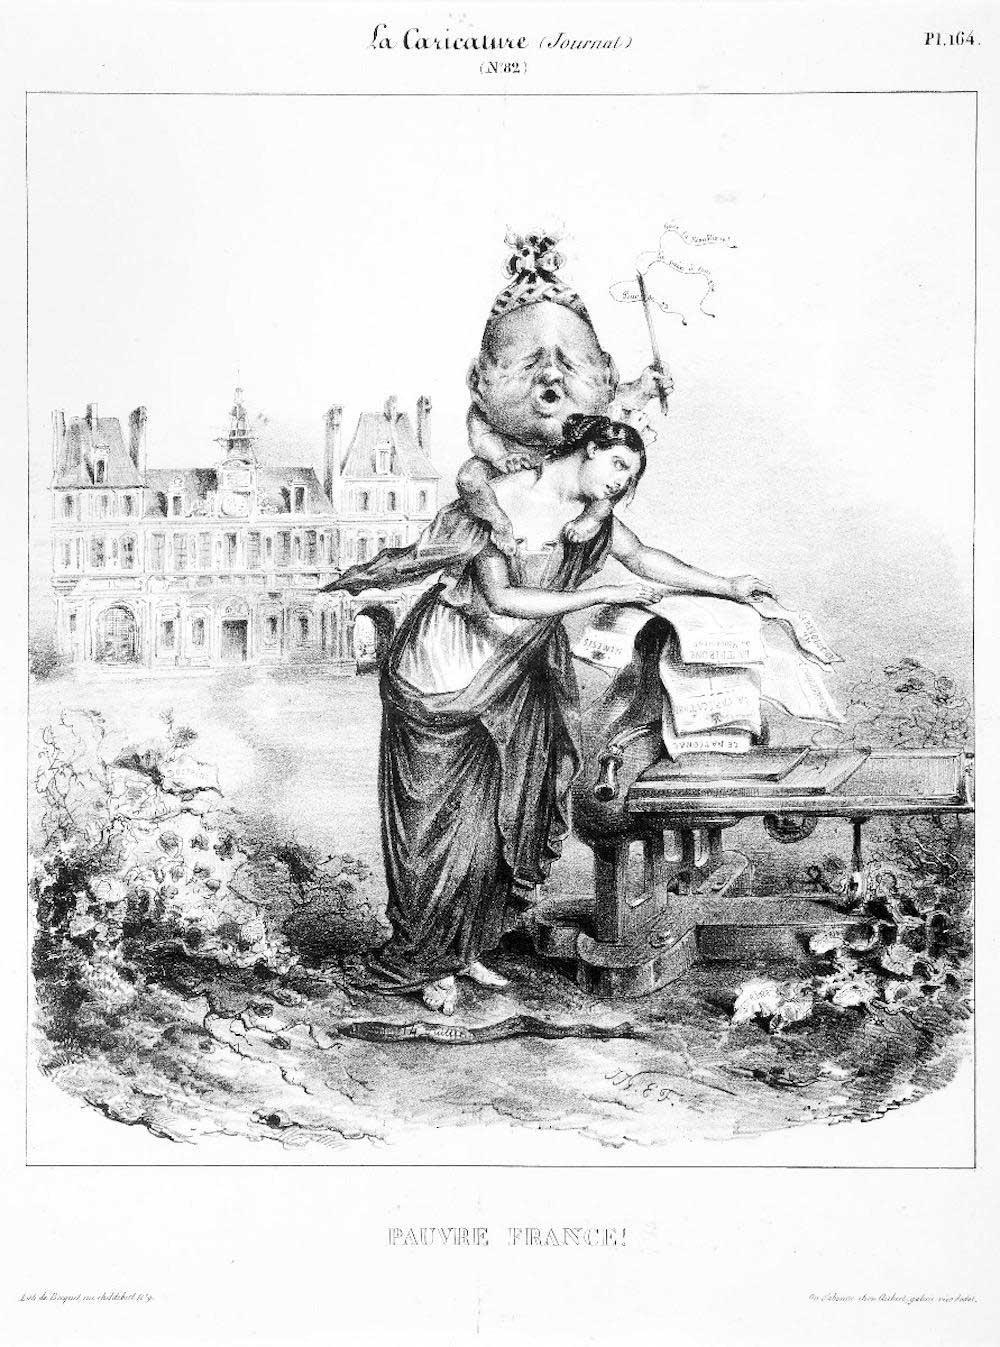 Lithograph - J.J. Grandville 1831